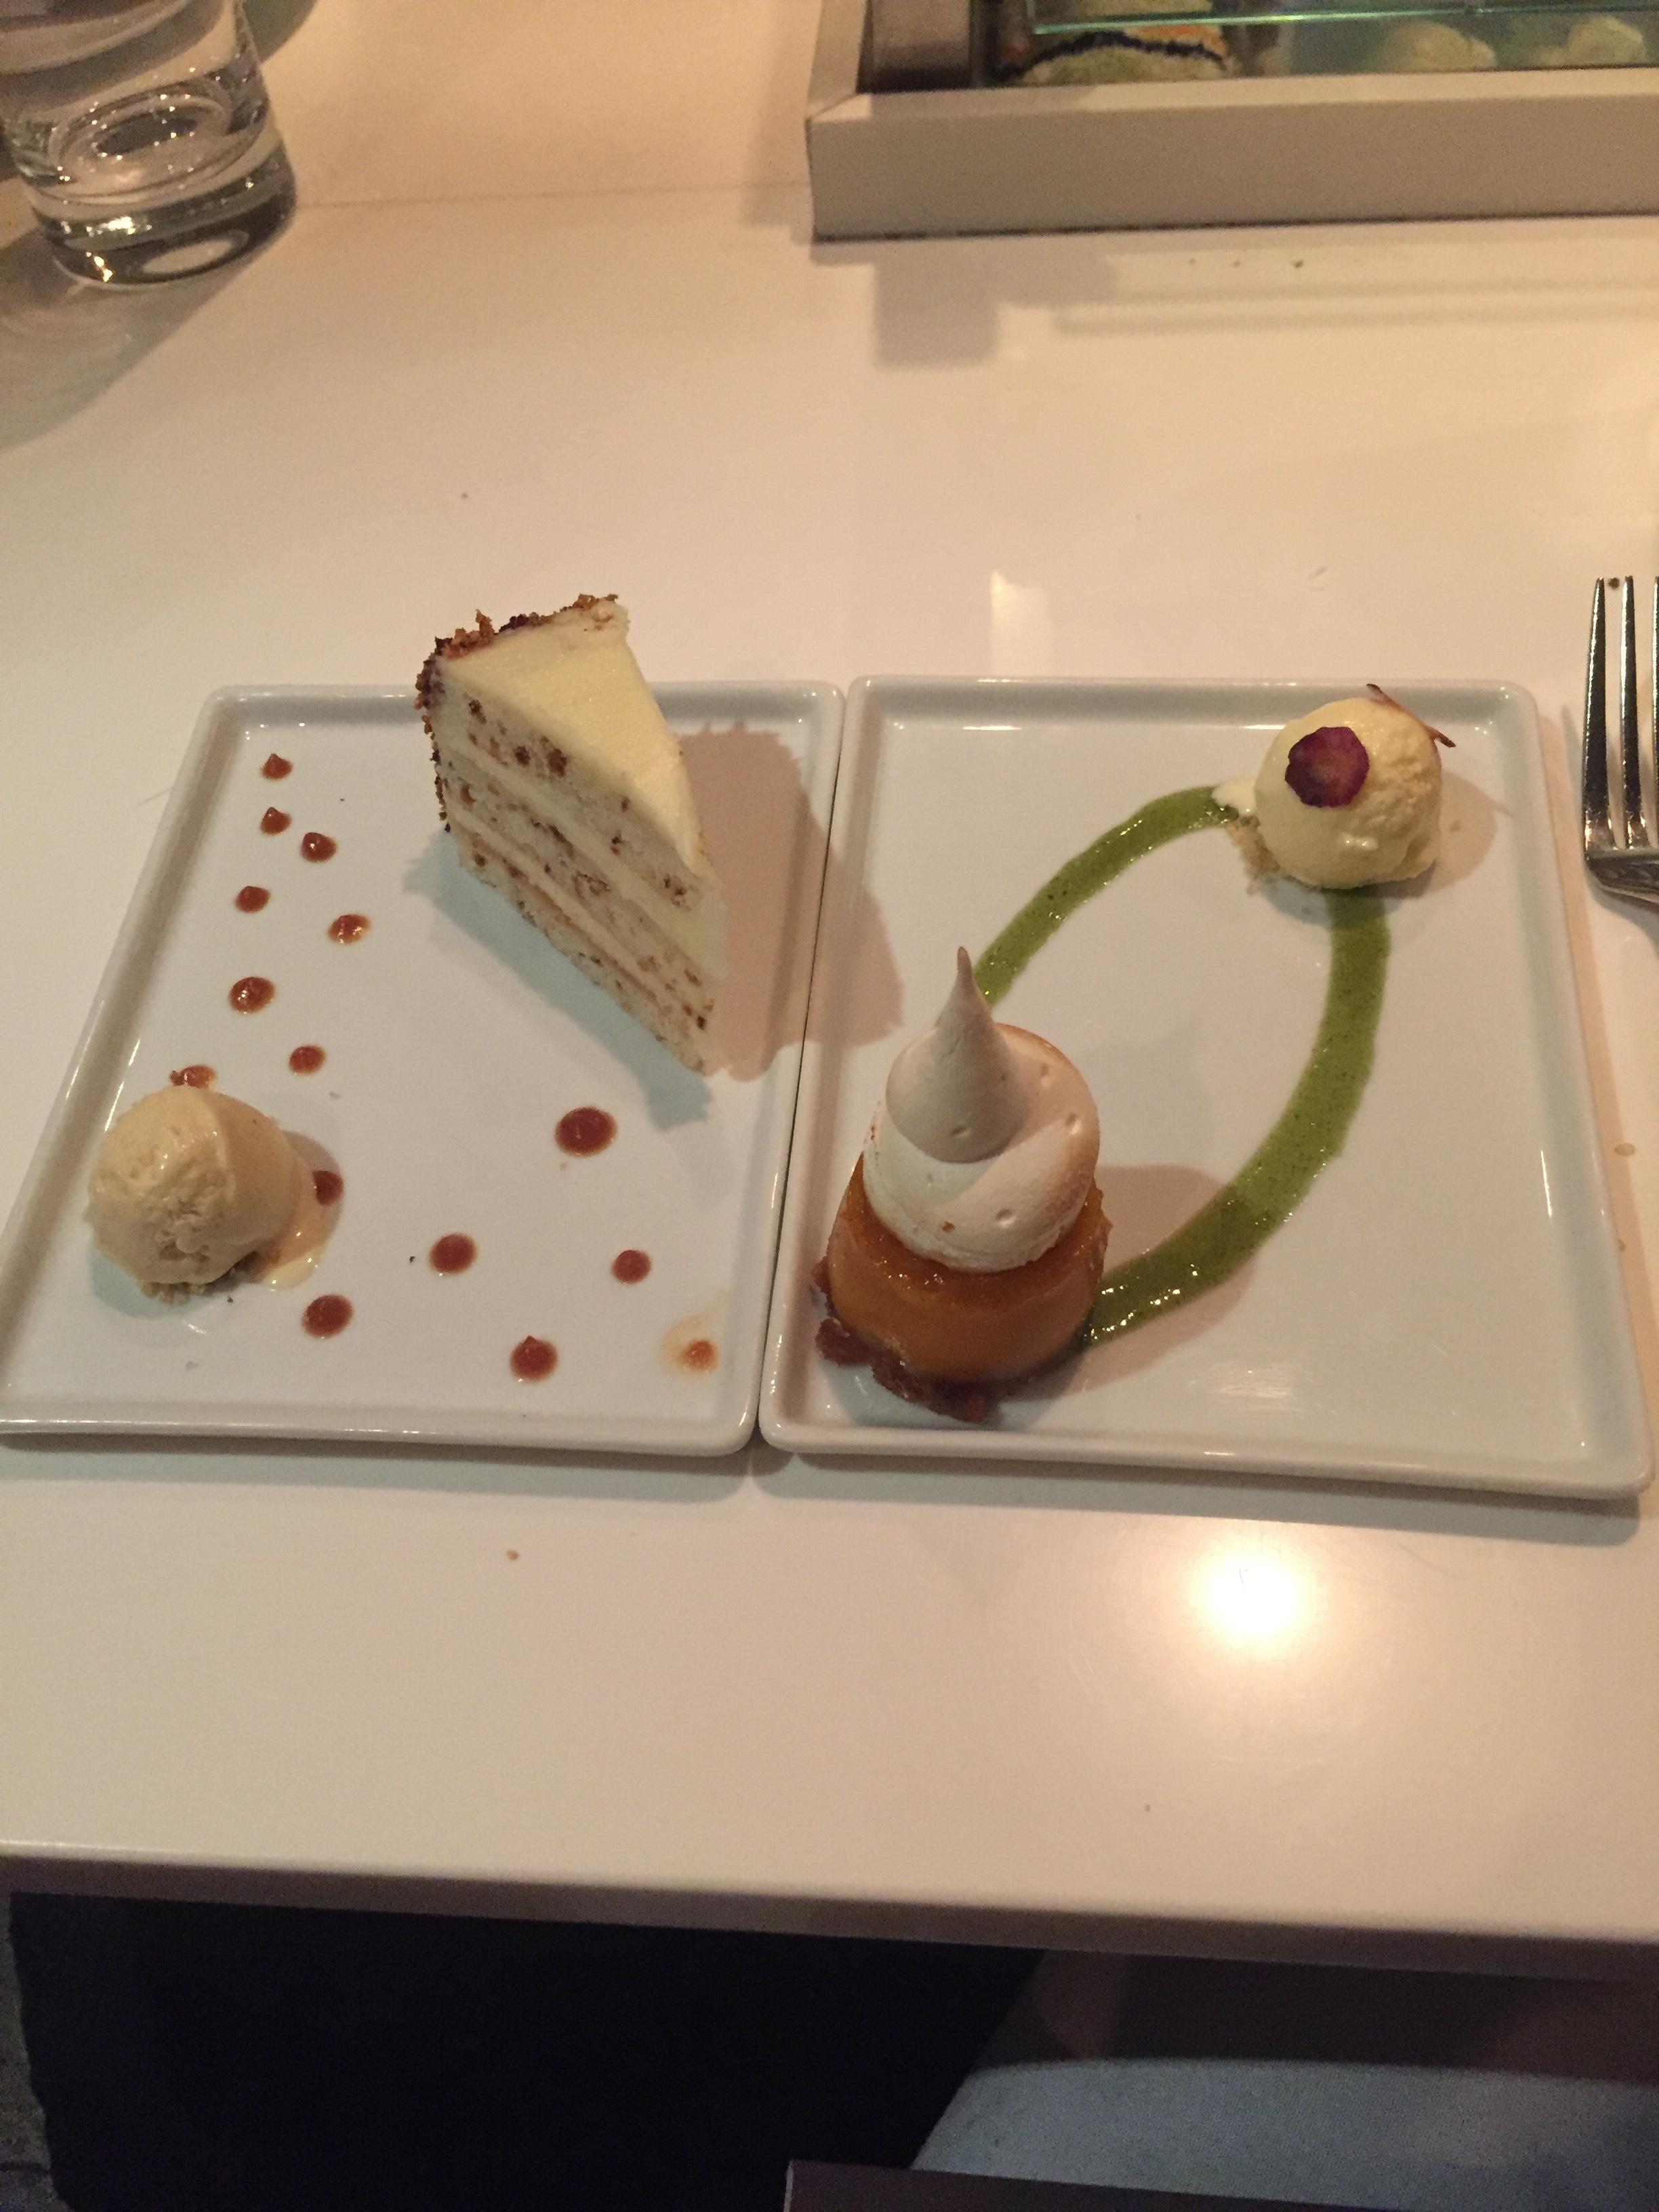 #7: The desserts!